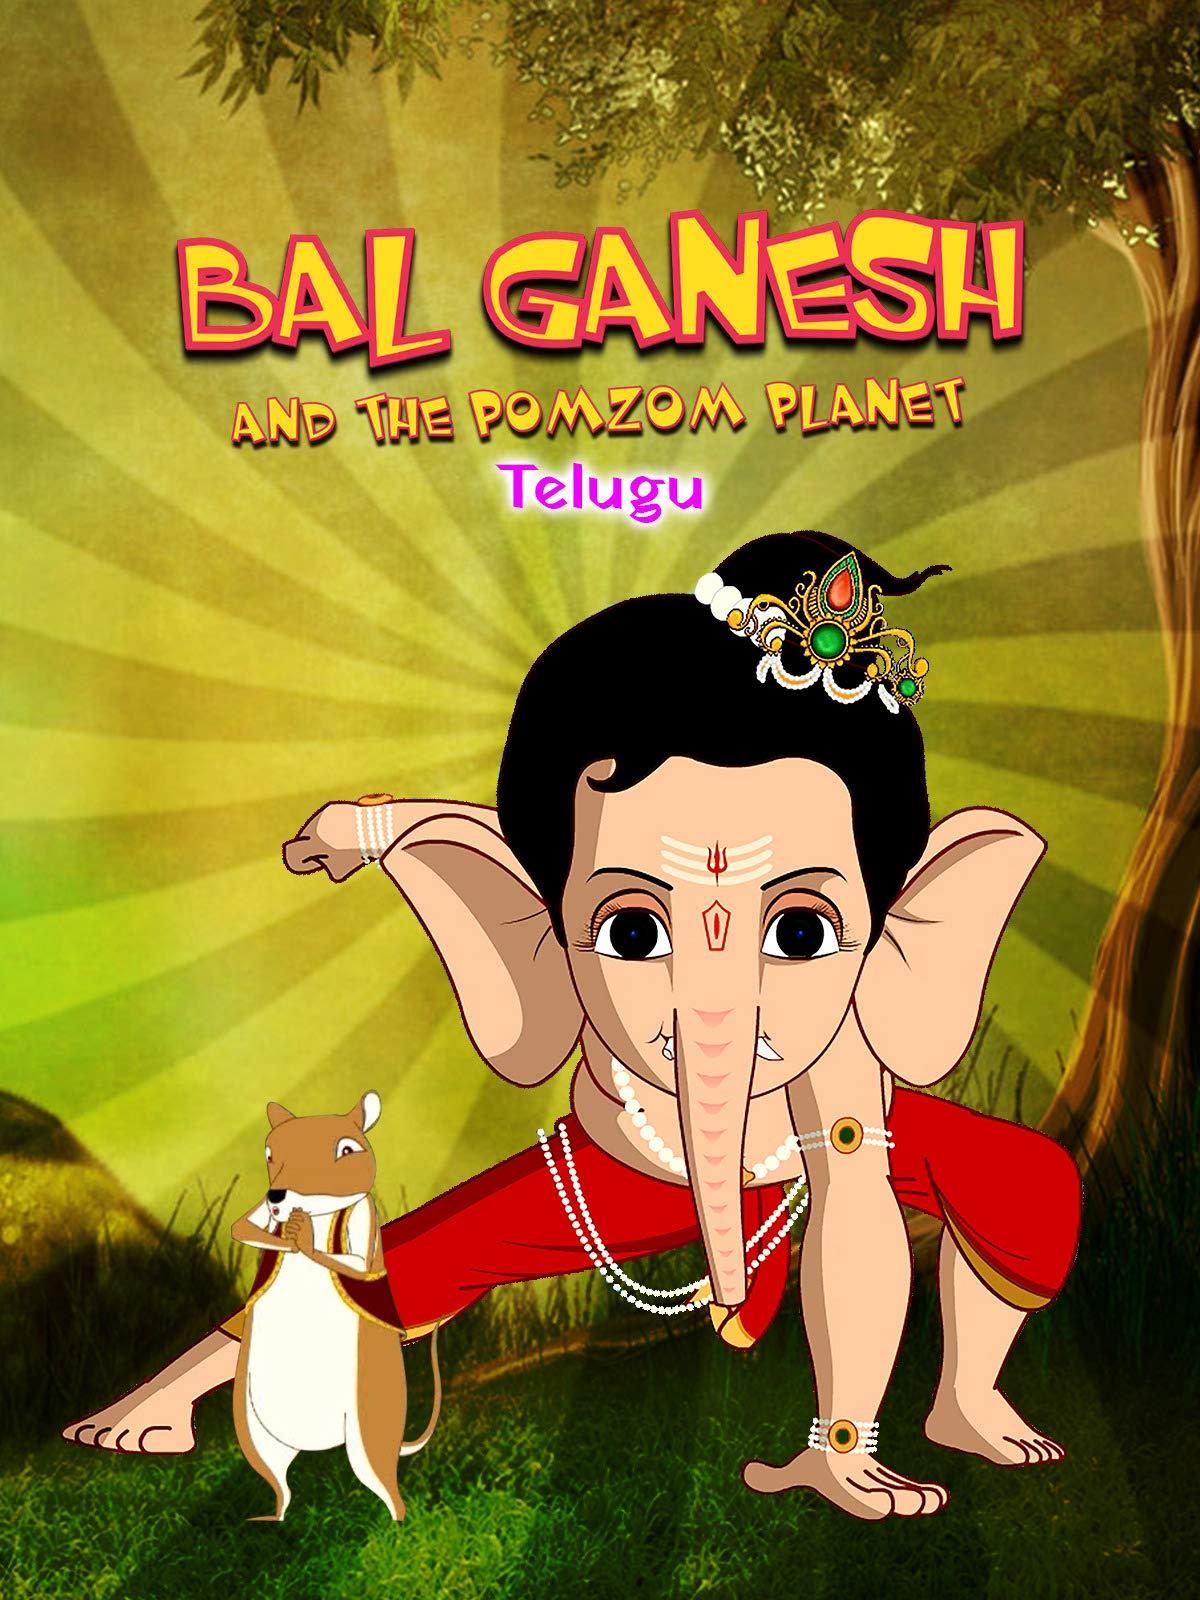 Bal Ganesh and PomZom Planet (Telugu)